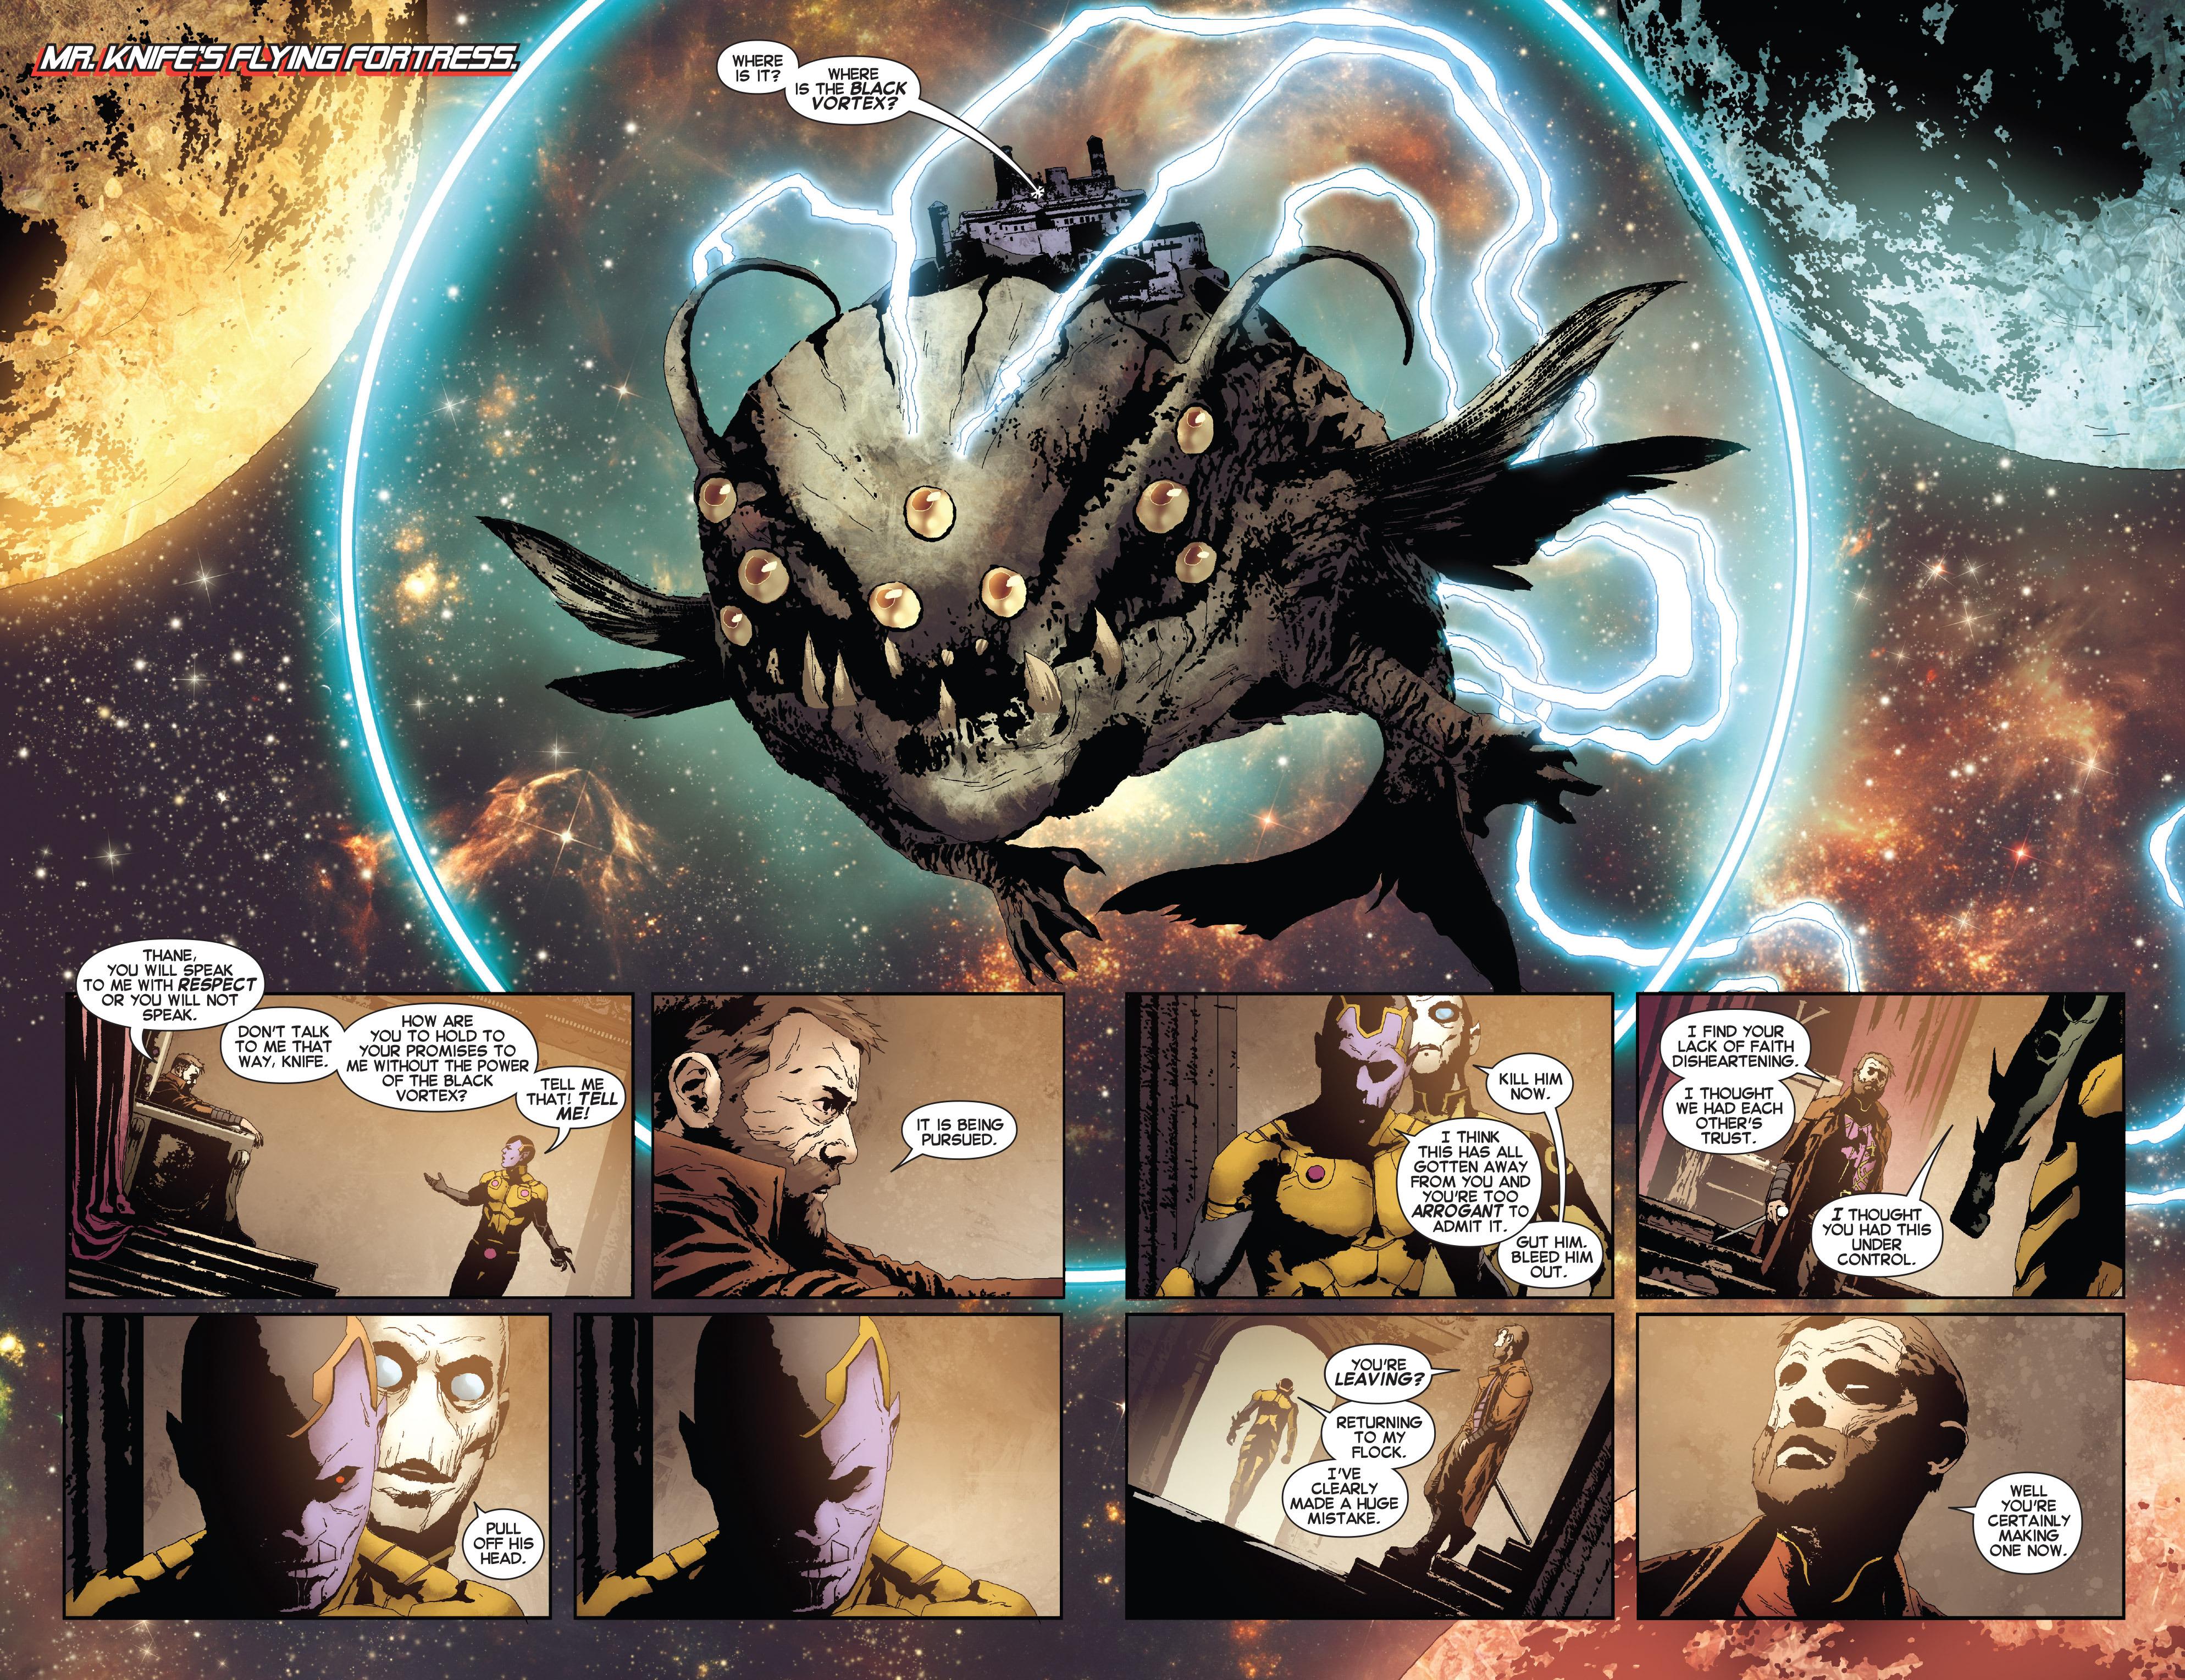 All-New X-Men (2013) chap 39 pic 6